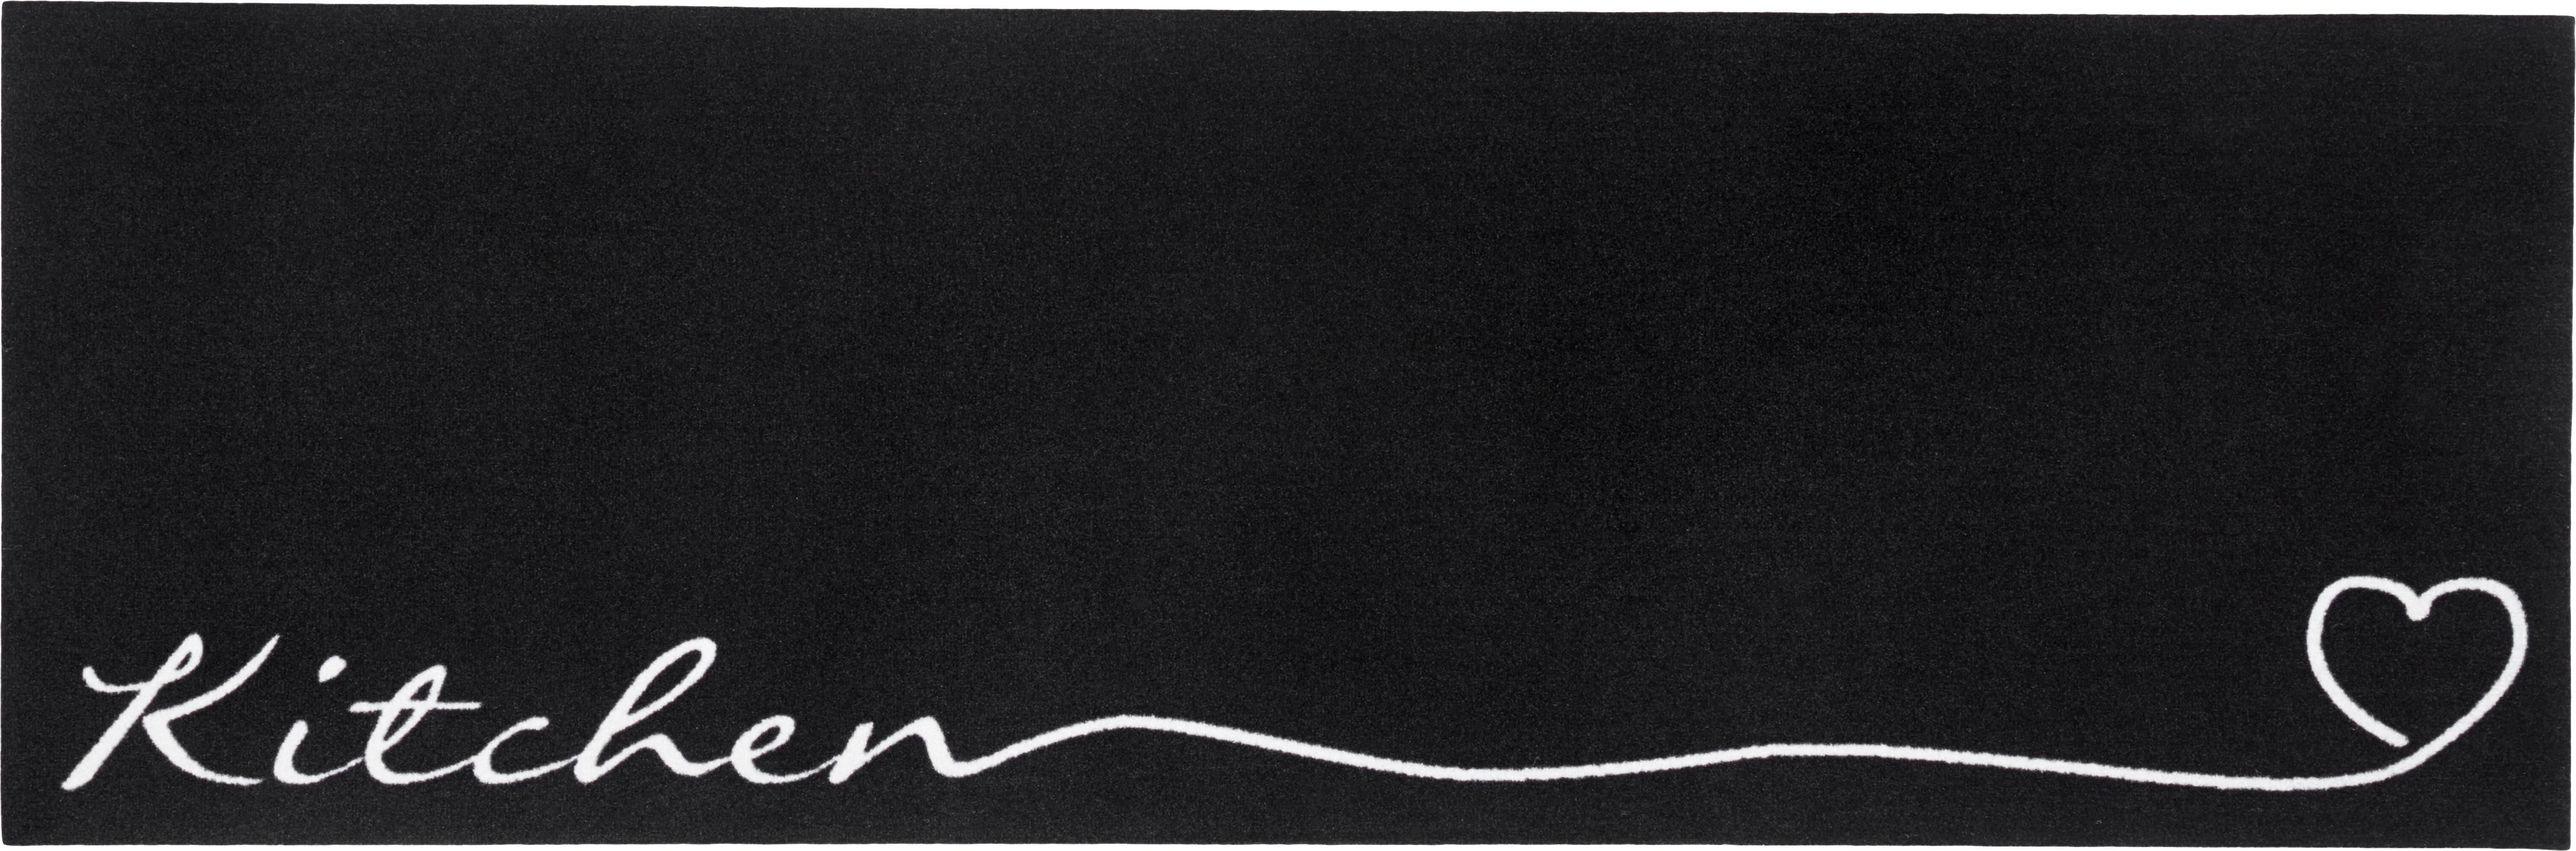 Passatoia da cucina antiscivolo Kitchen, Nero, bianco, Larg. 50 x Lung. 150cm